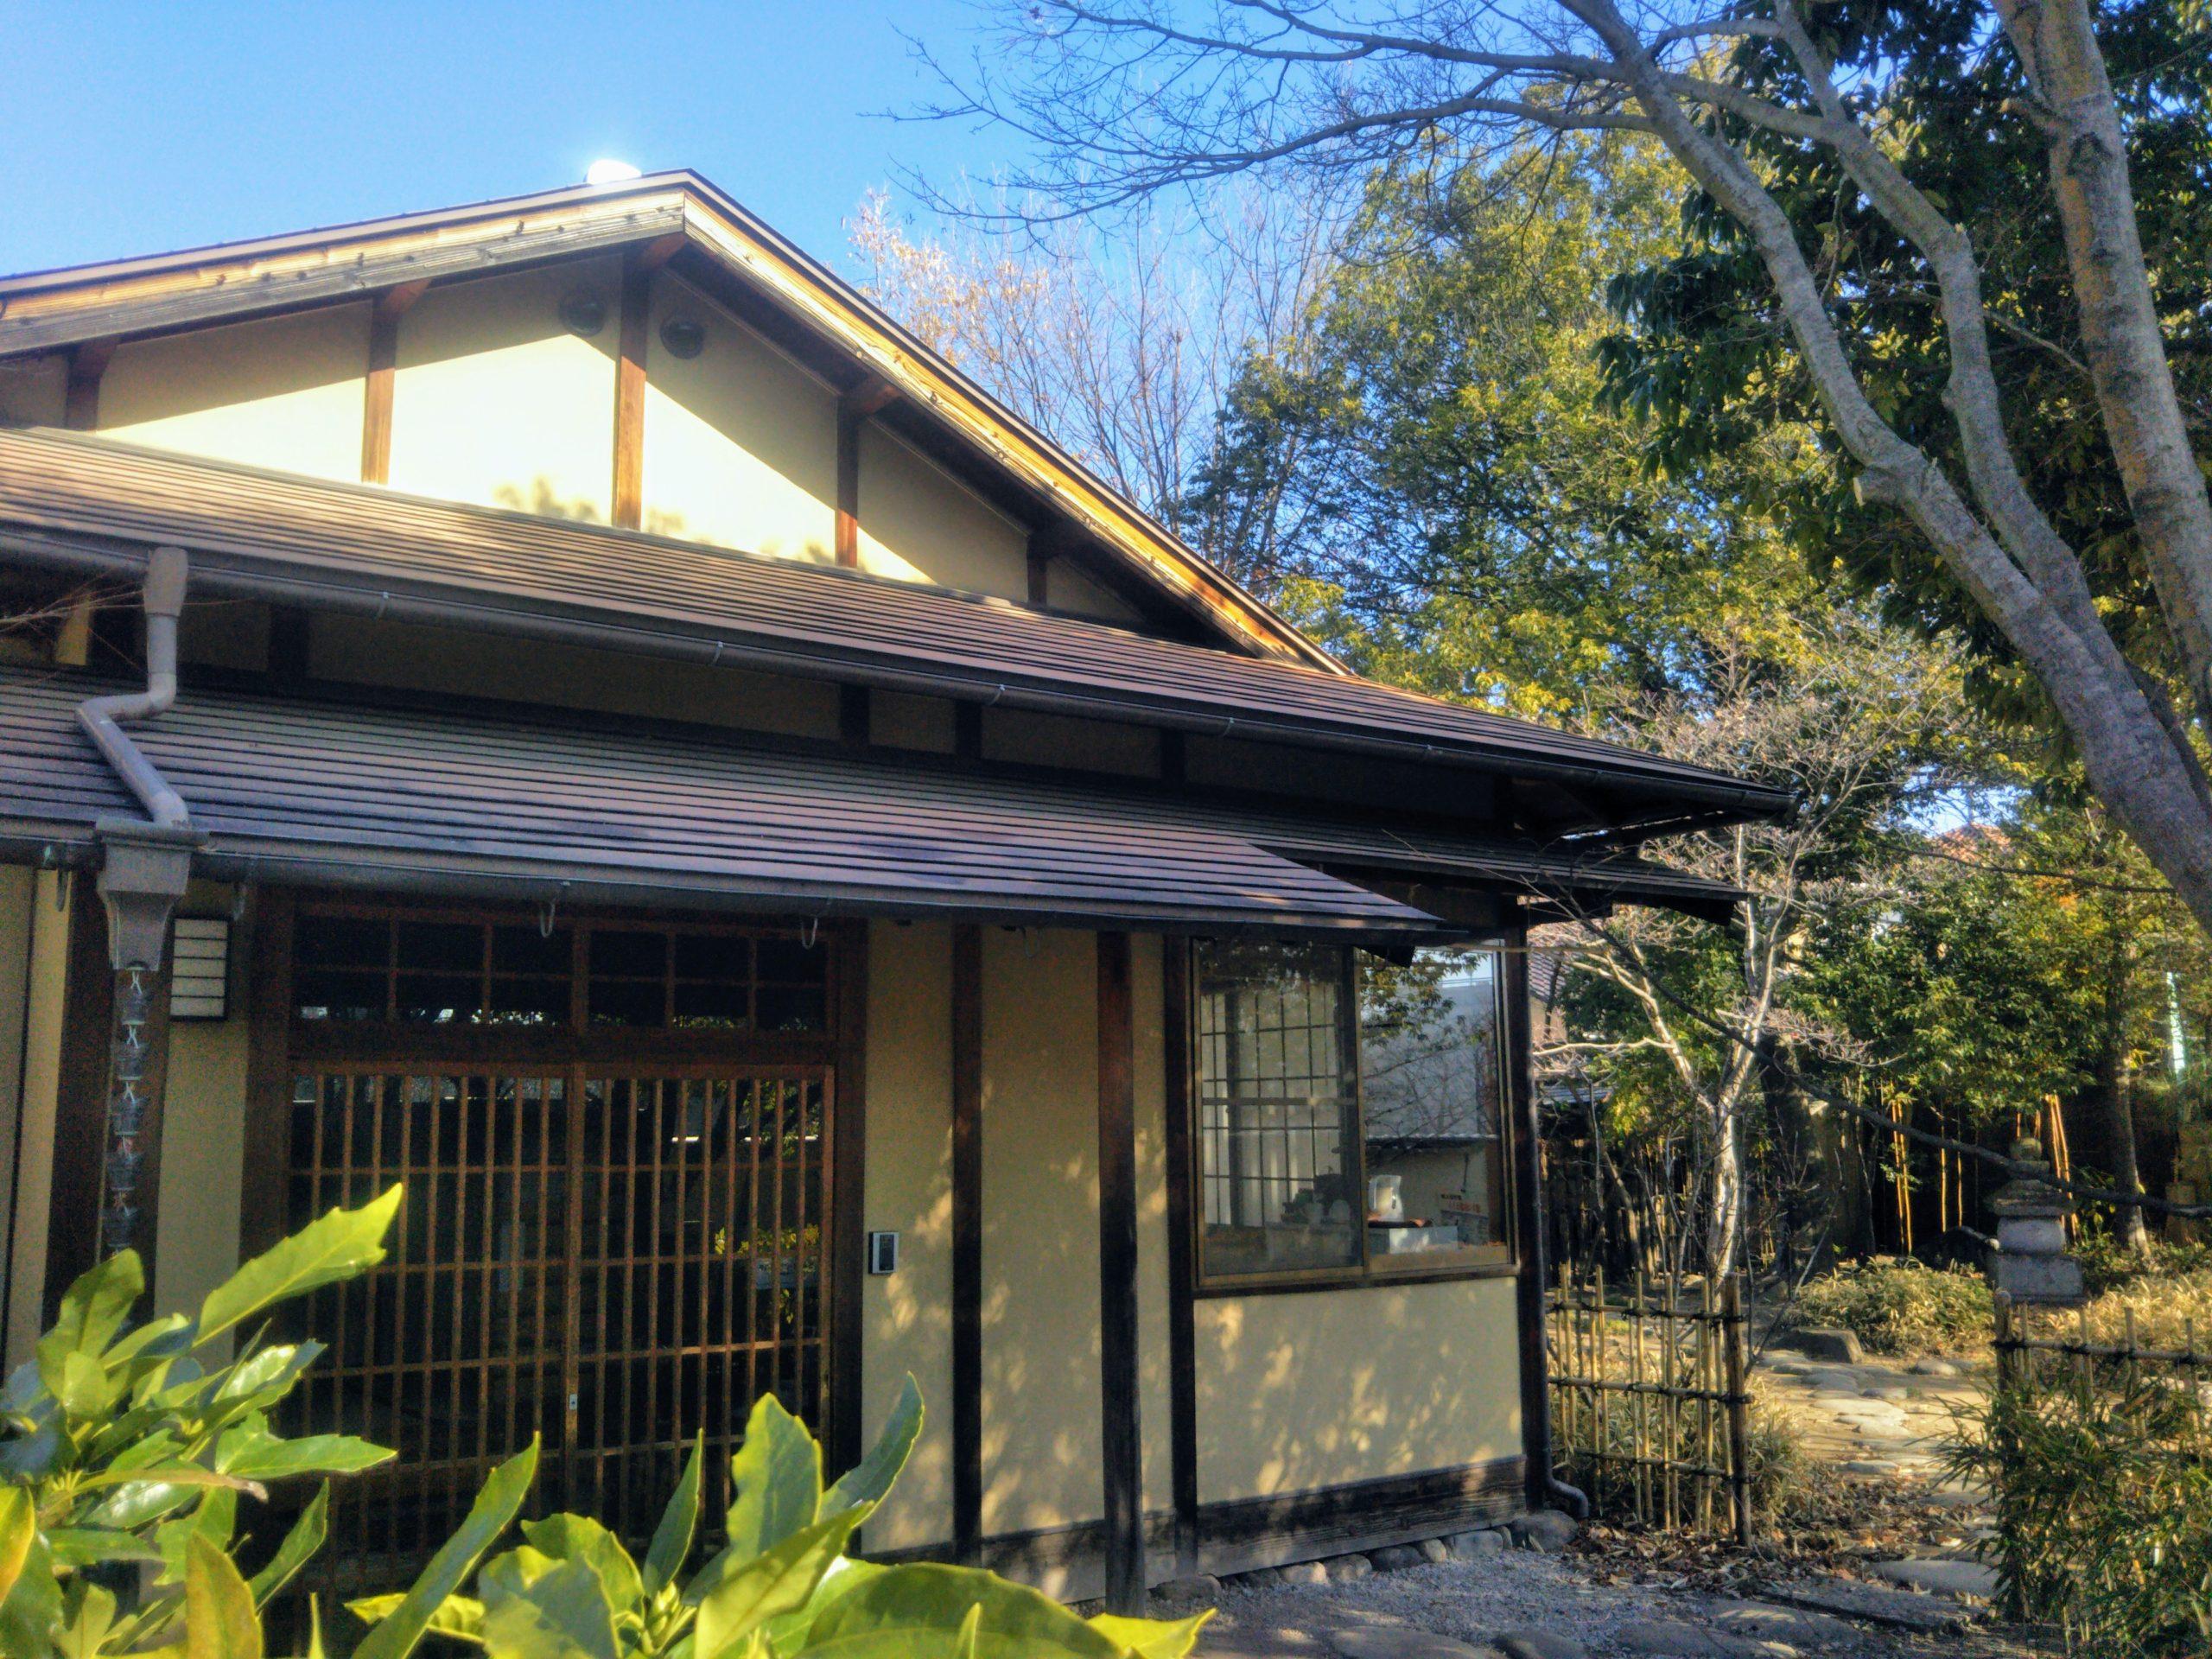 Maison de Thé Ikegami nagano